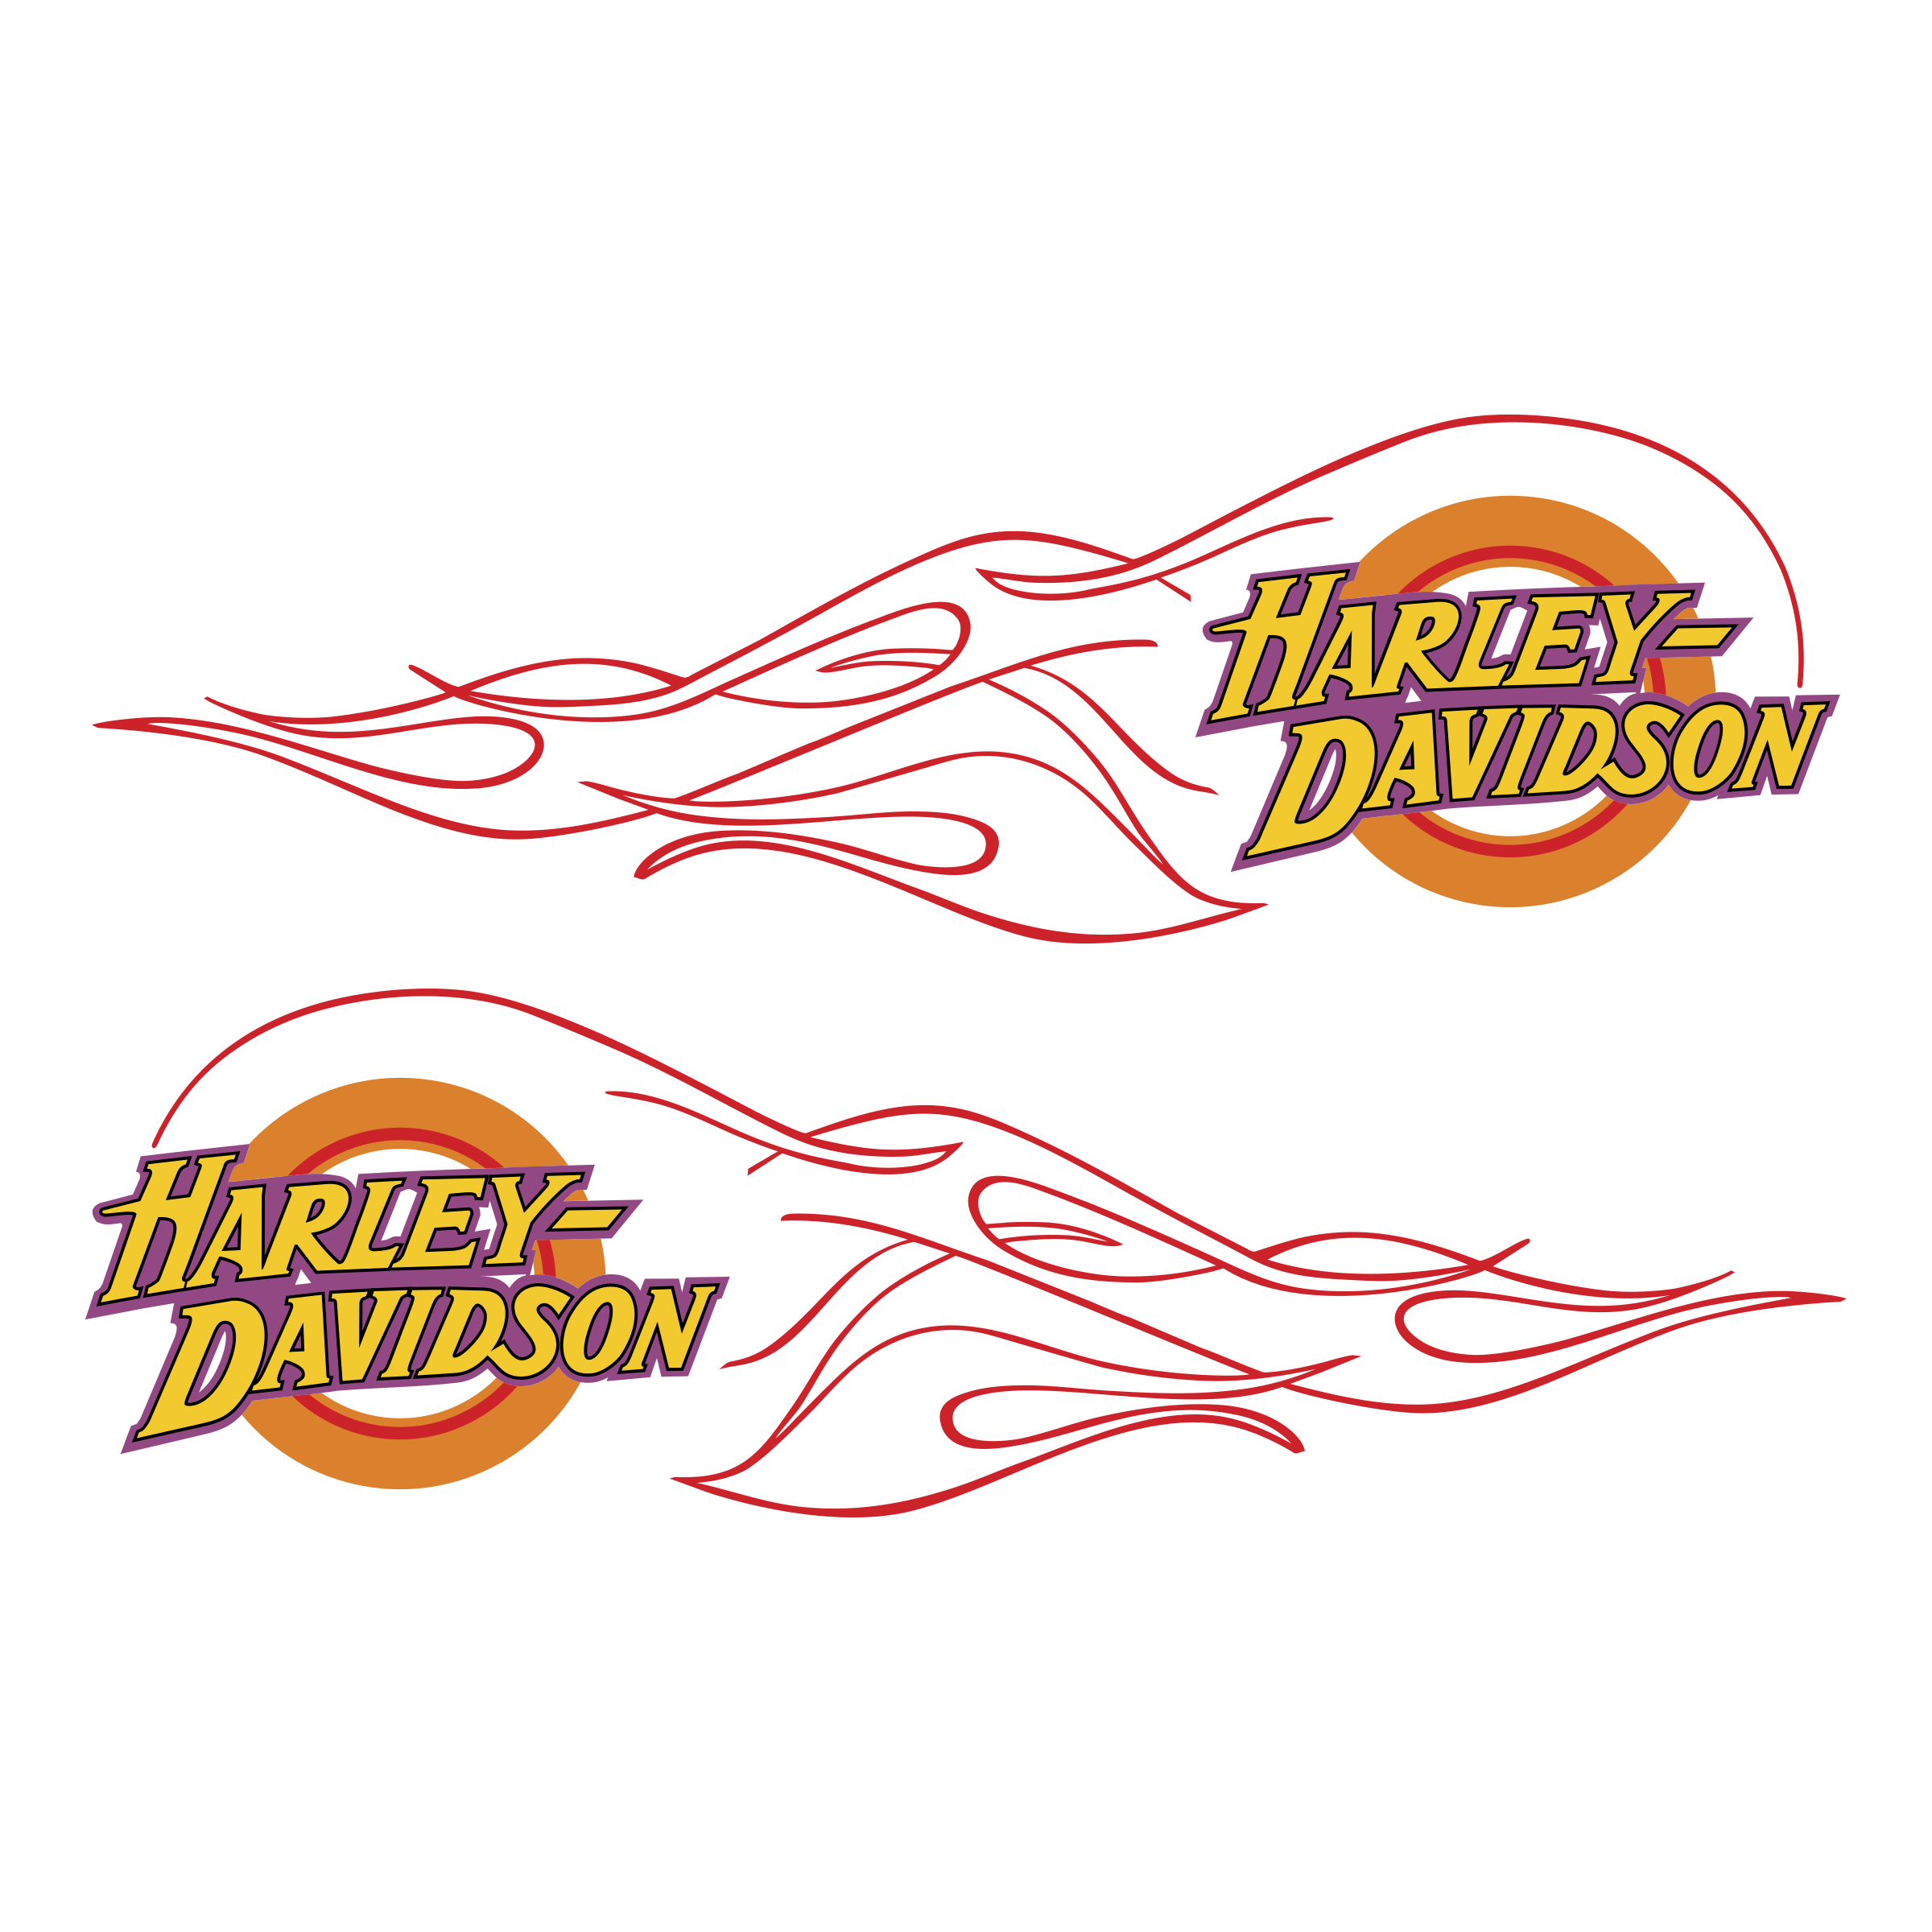 Harley davidson flame logo. Flames vector png